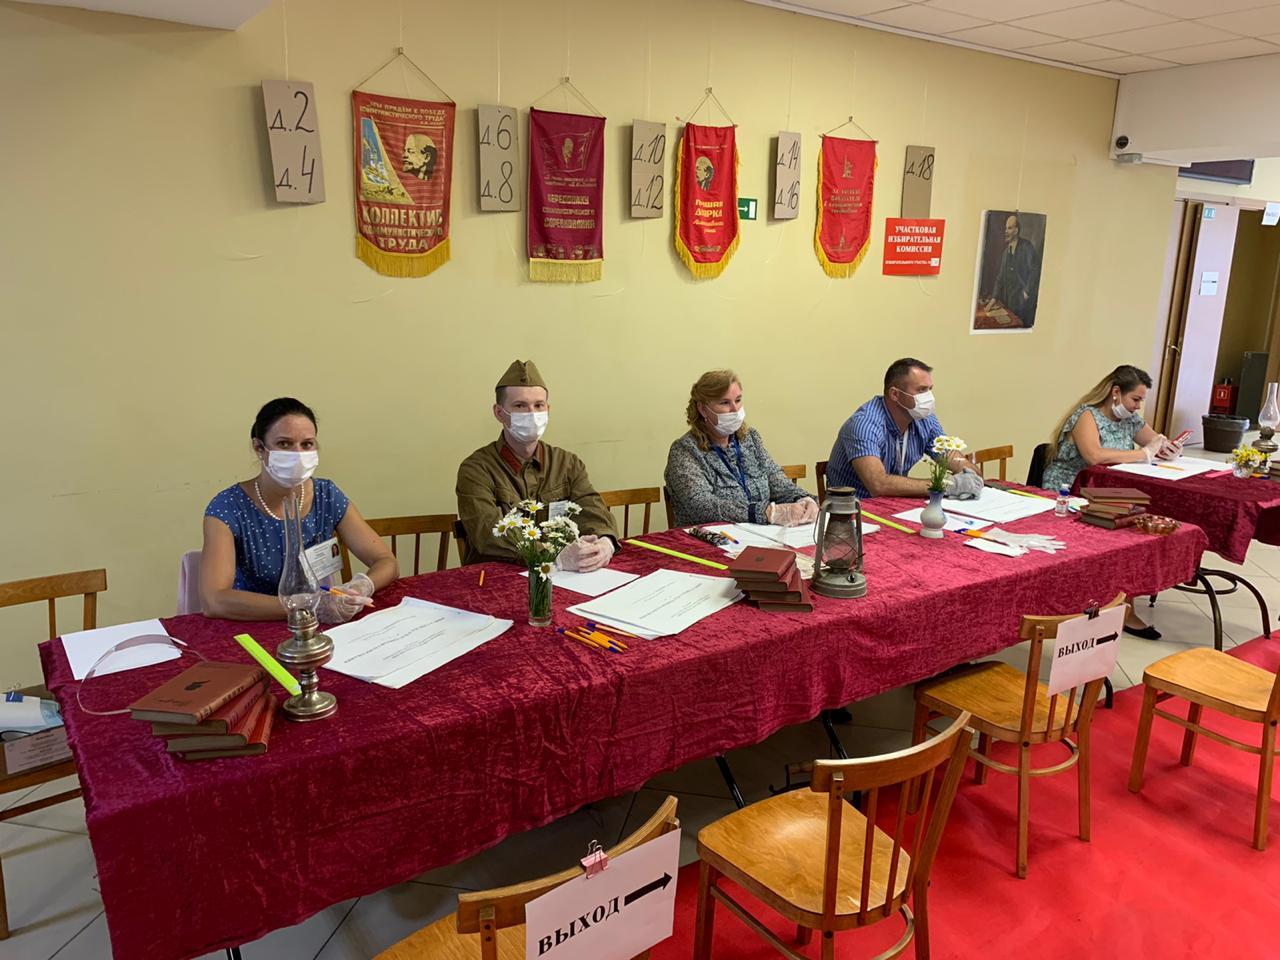 фото ЗакС политика В Горбунках за поправки в Конституцию голосуют в сталинском антураже